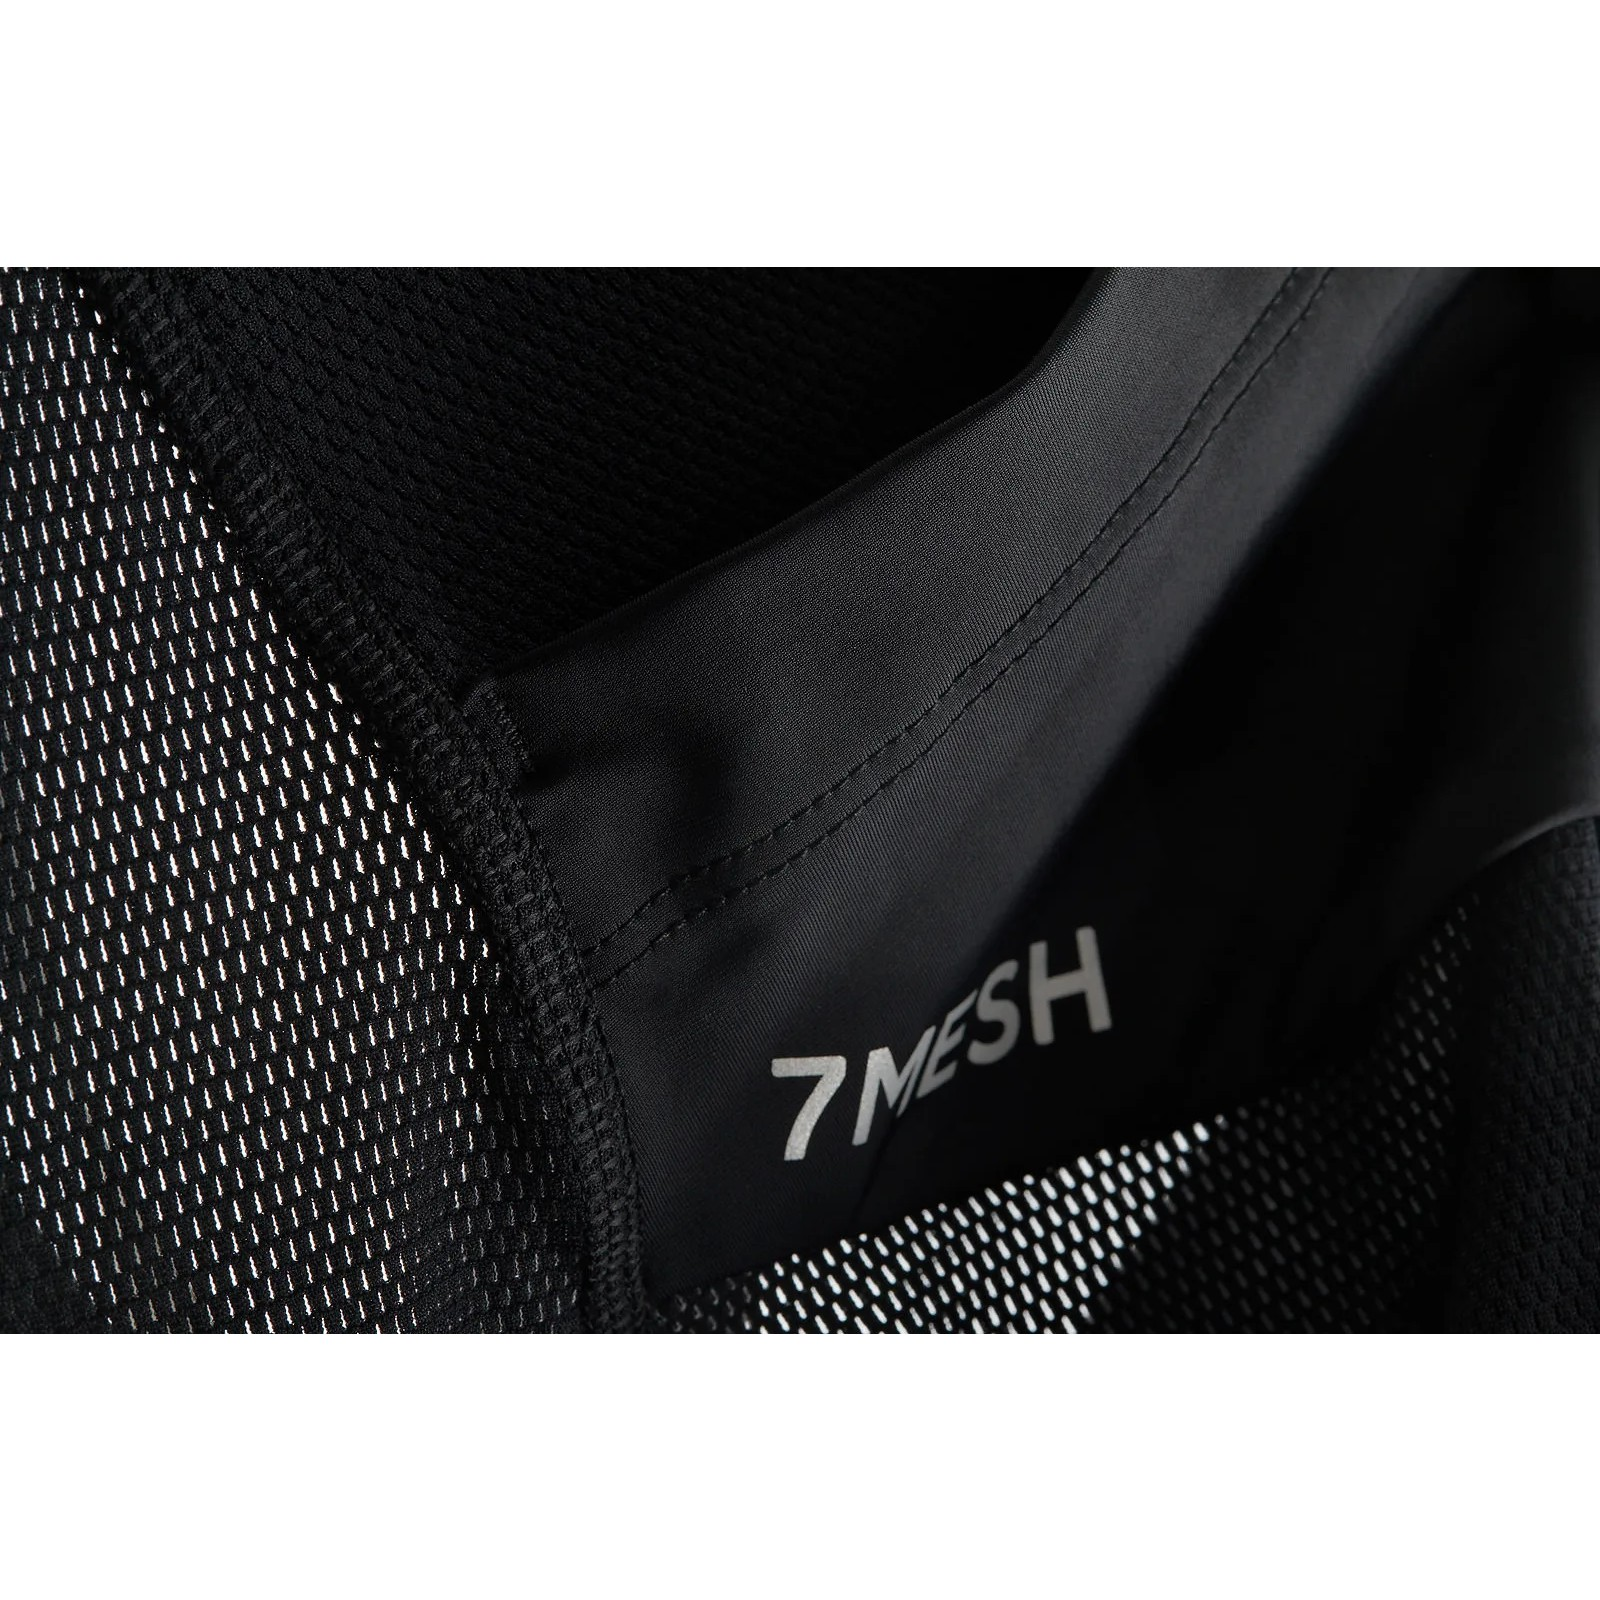 Imagen de 7mesh Foundation Culotte con tirantes para hombres - Black